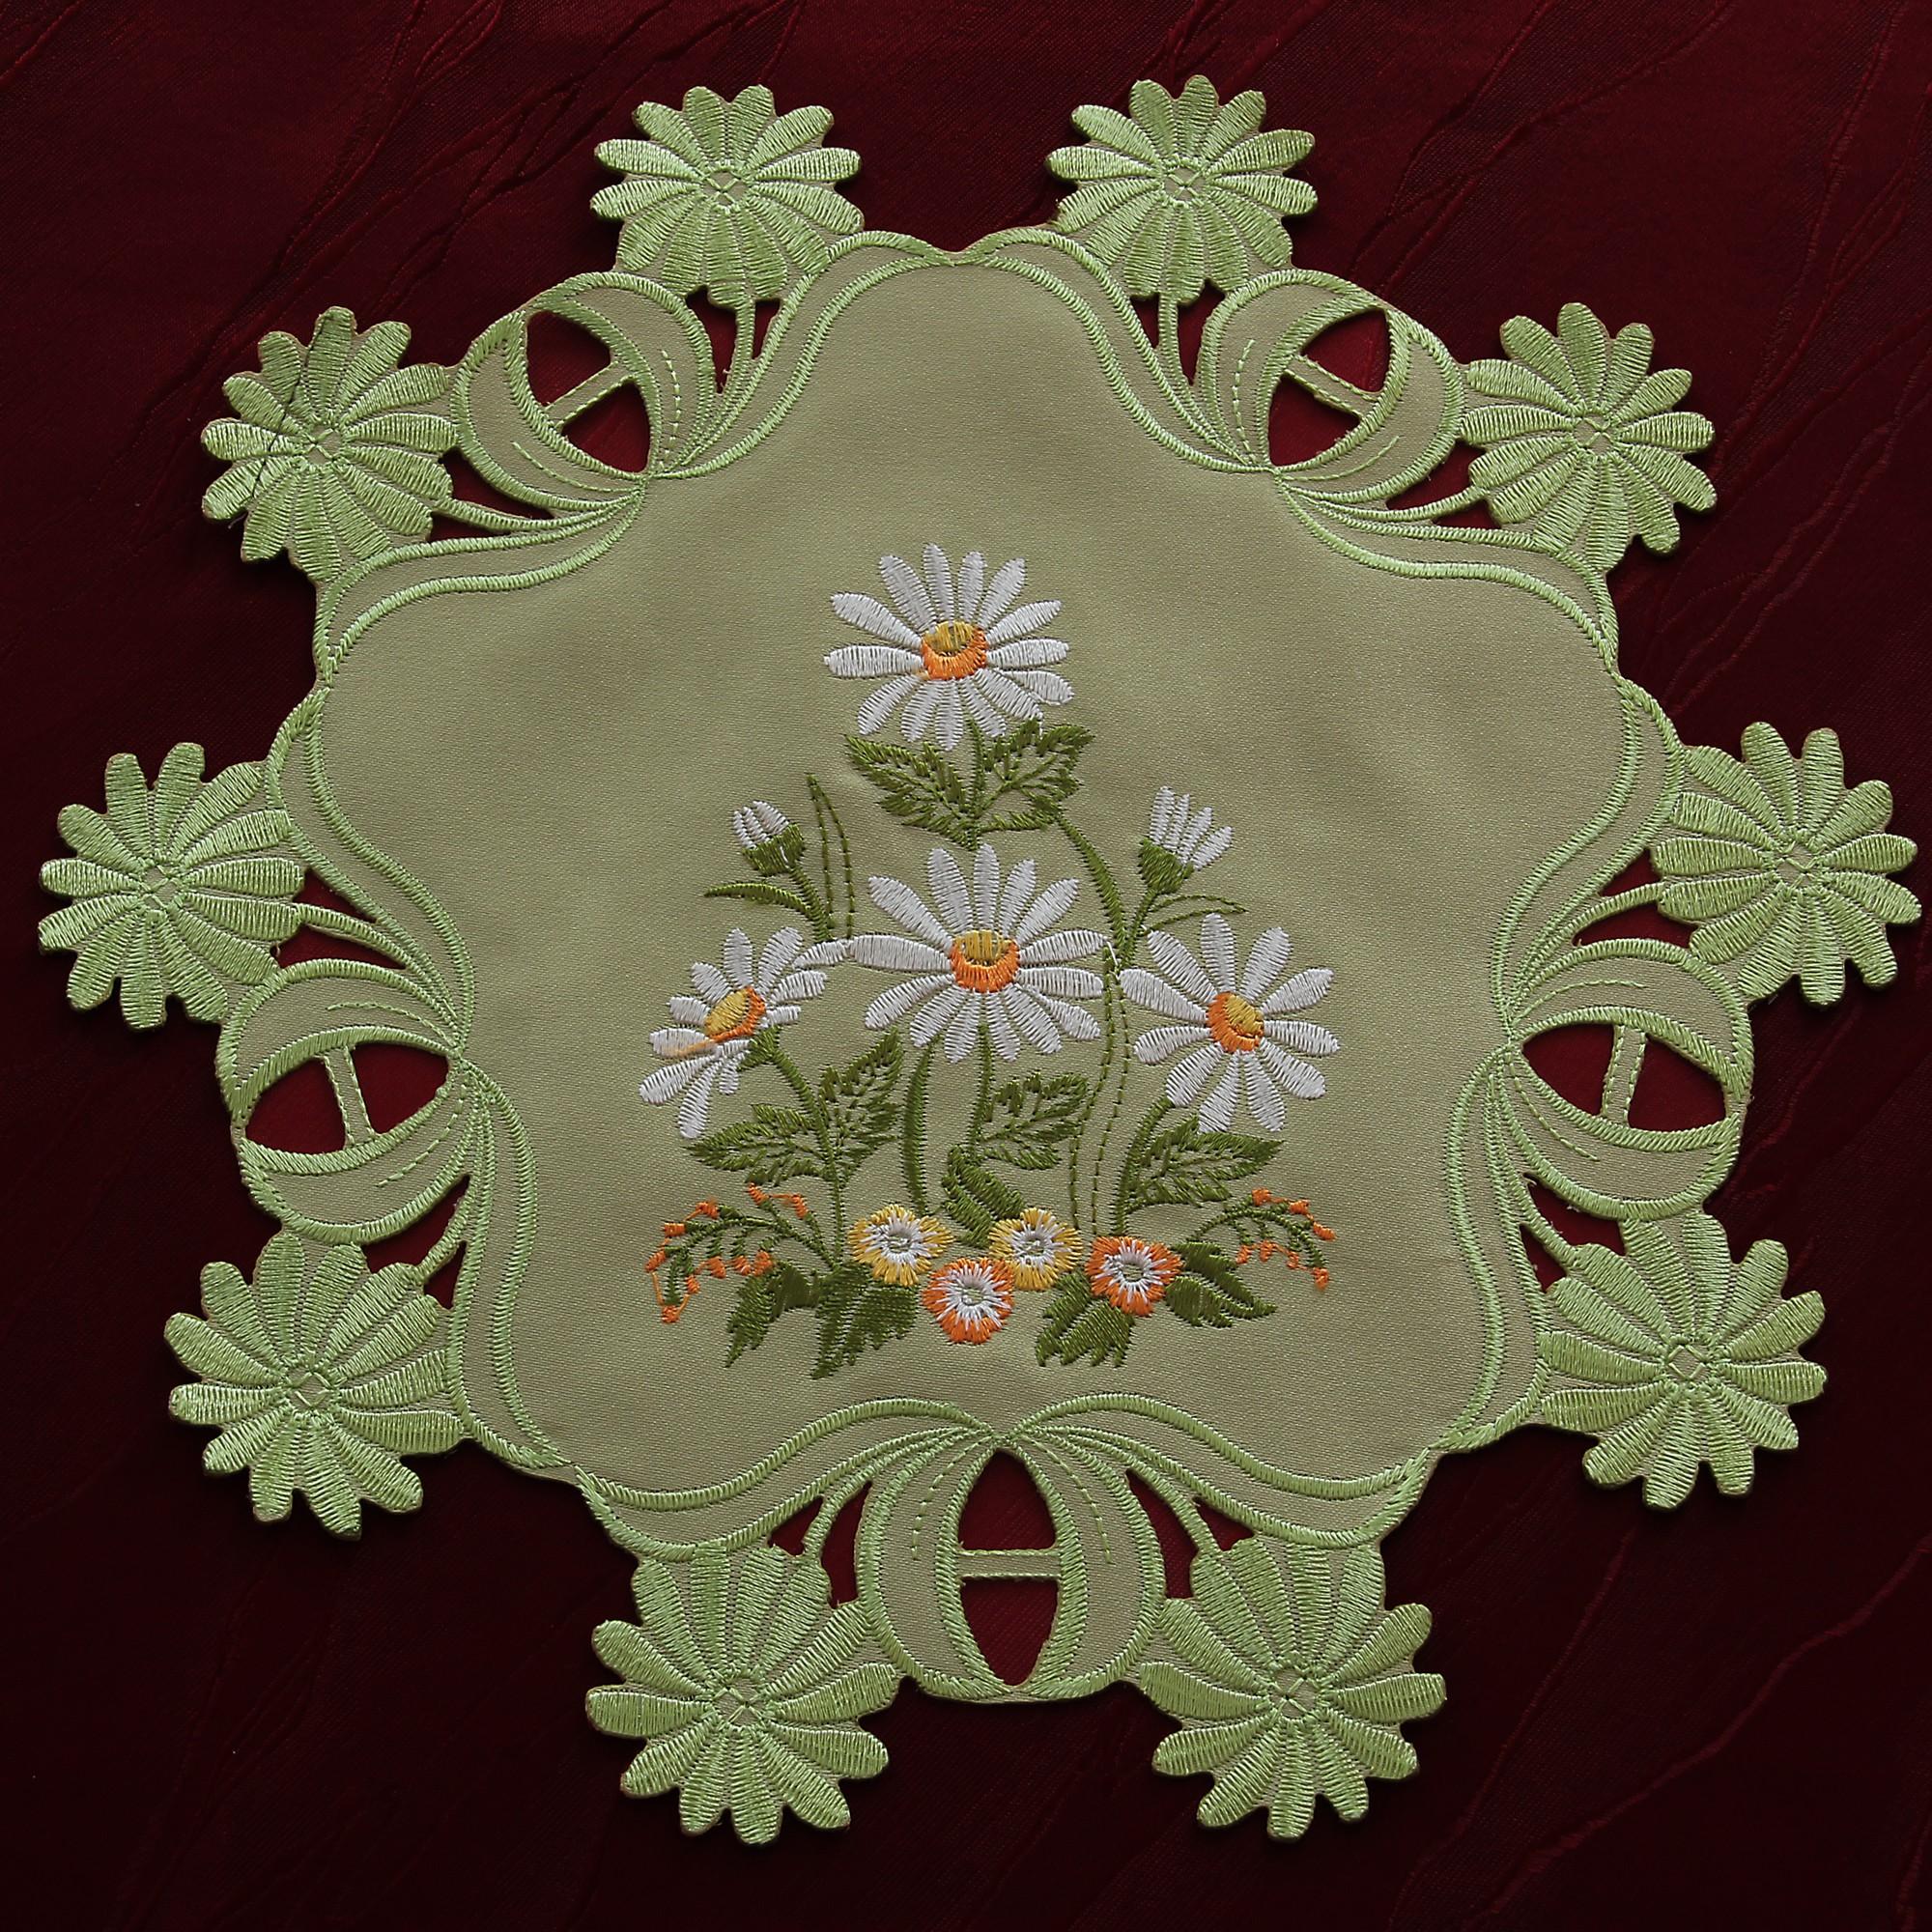 Green Table Runner Tablecloth Doily White Marguerite Daisy